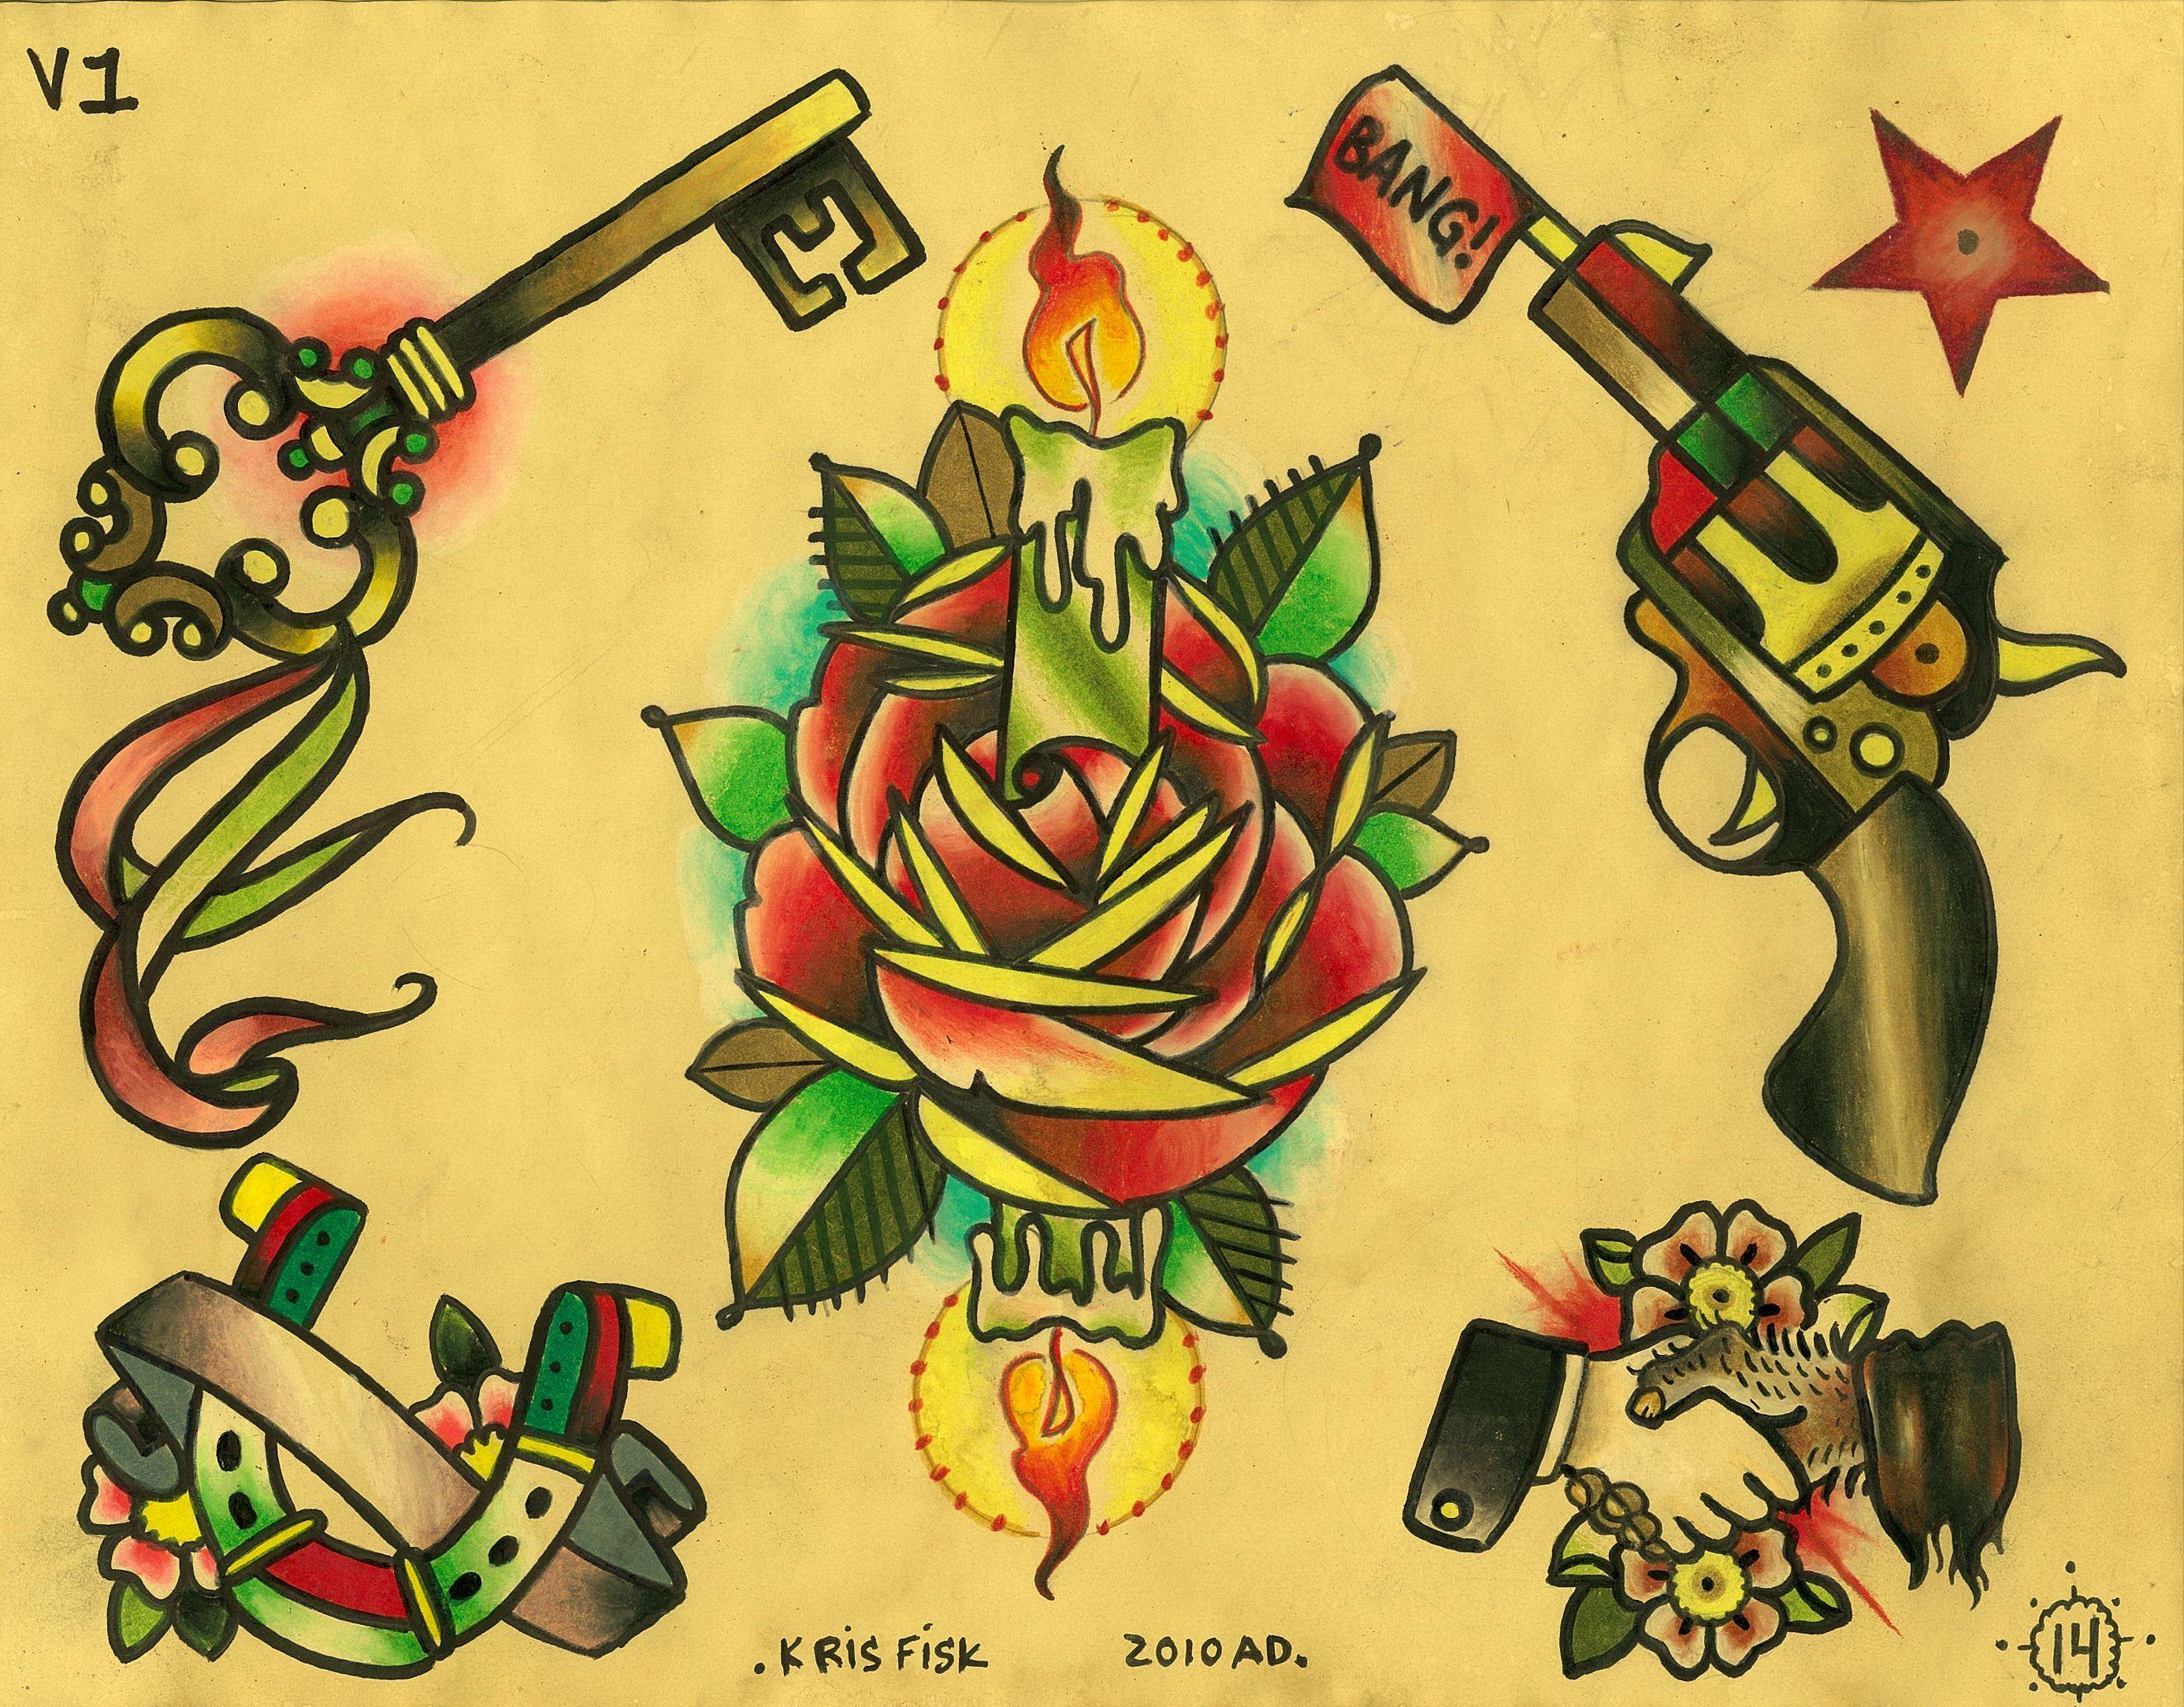 http://krisfisk.com/wp-content/uploads/2011/10/traditional-tattoo-flash-16.jpg